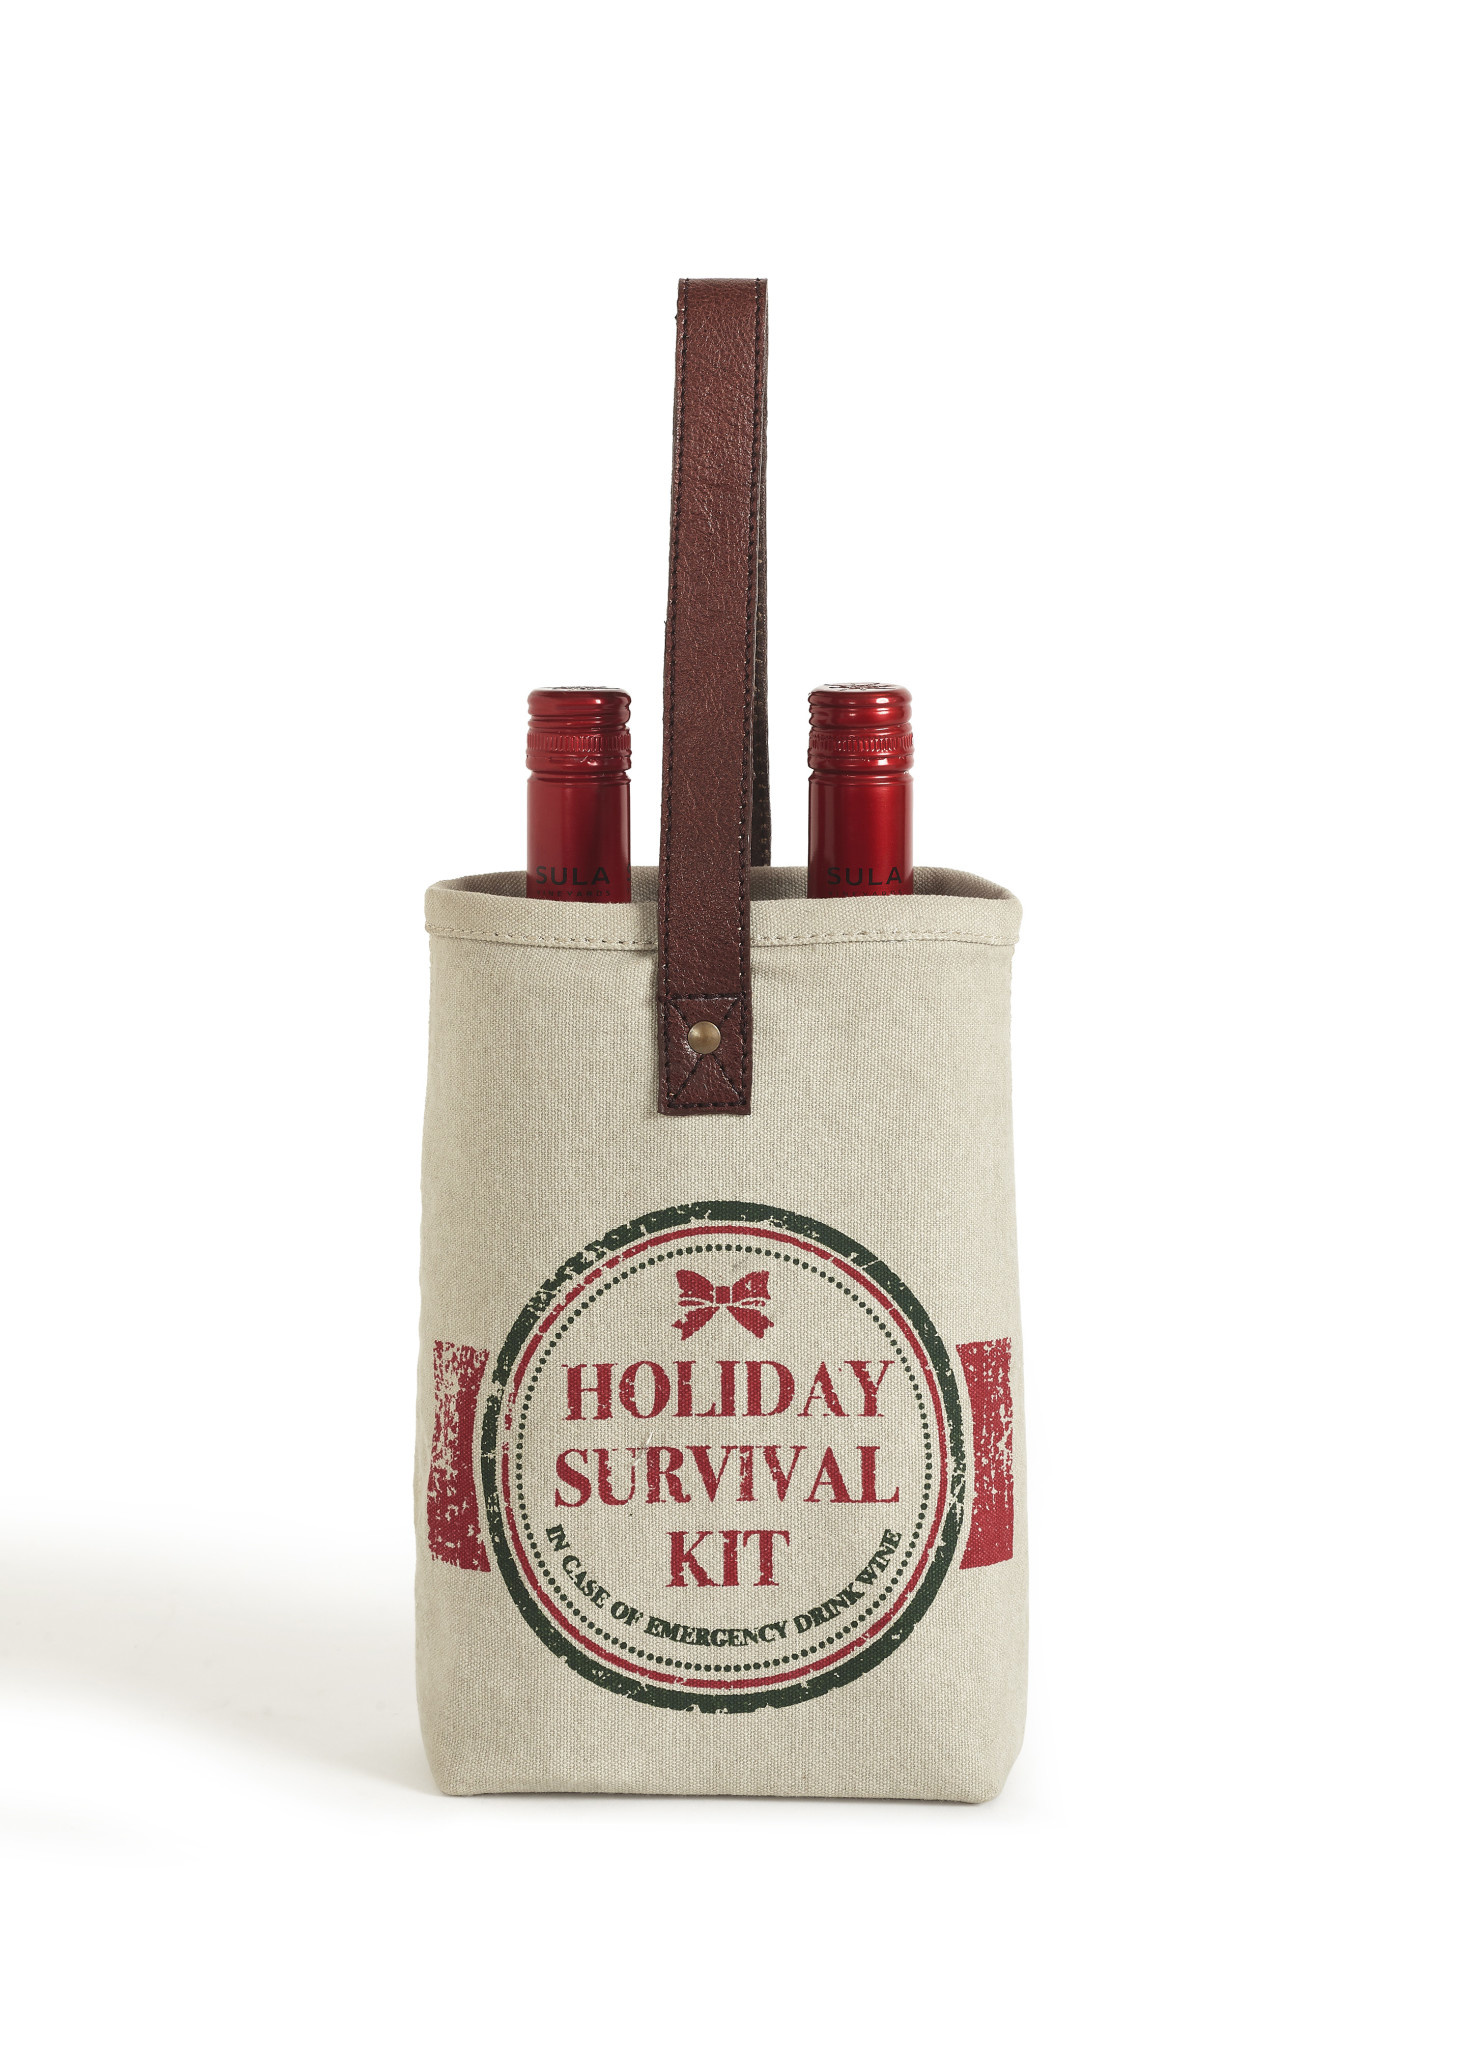 Mona B Holiday Survival Kit Double Wine Bag